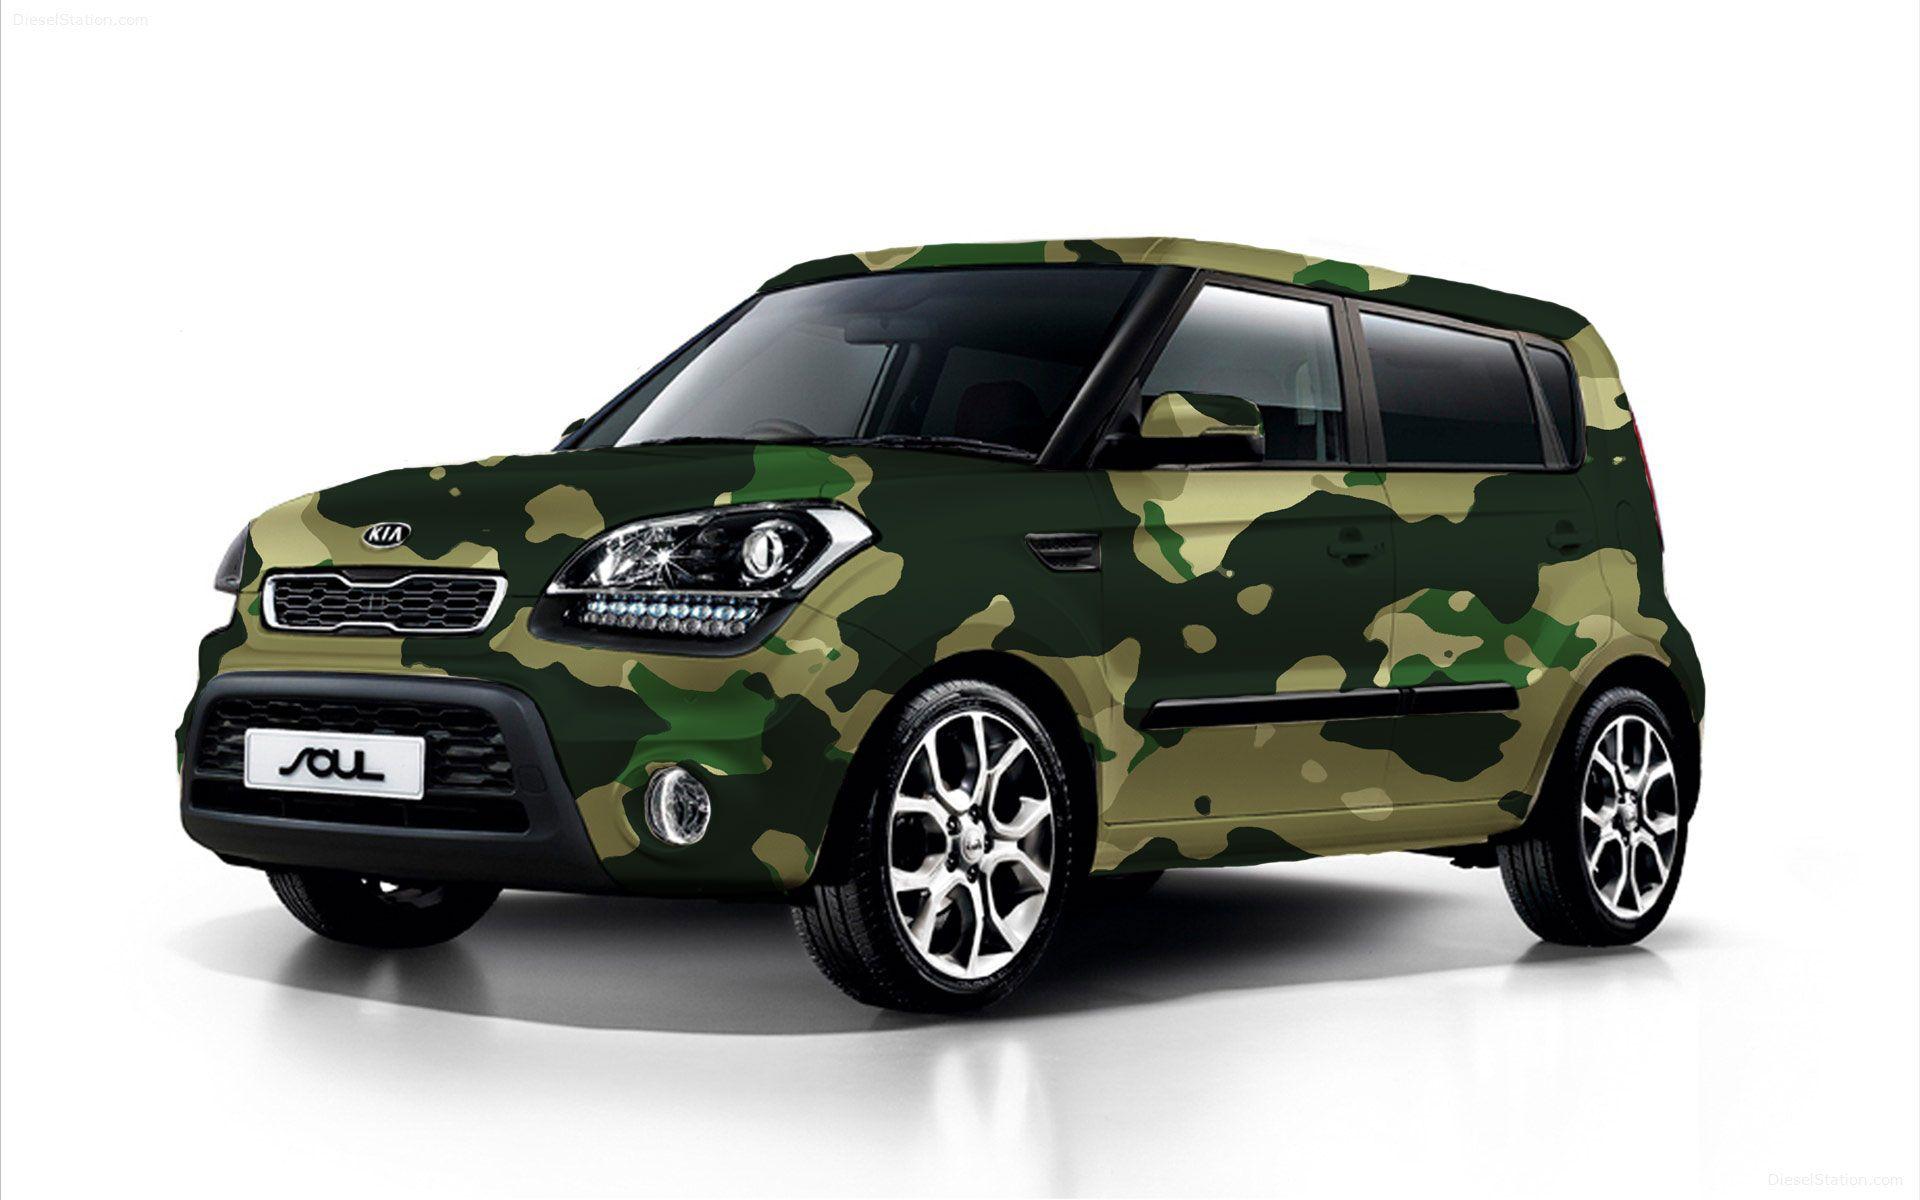 Traditional green camo wrap design for a 2013 Kia Soul